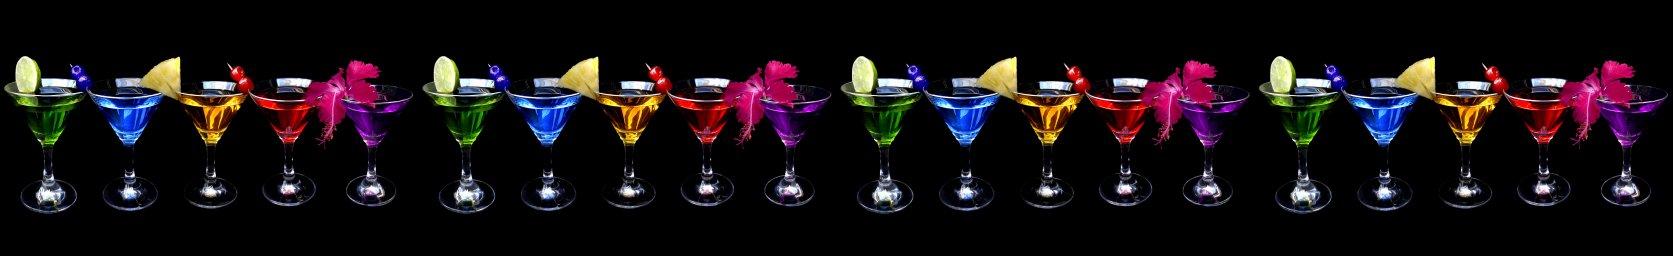 drinks-007